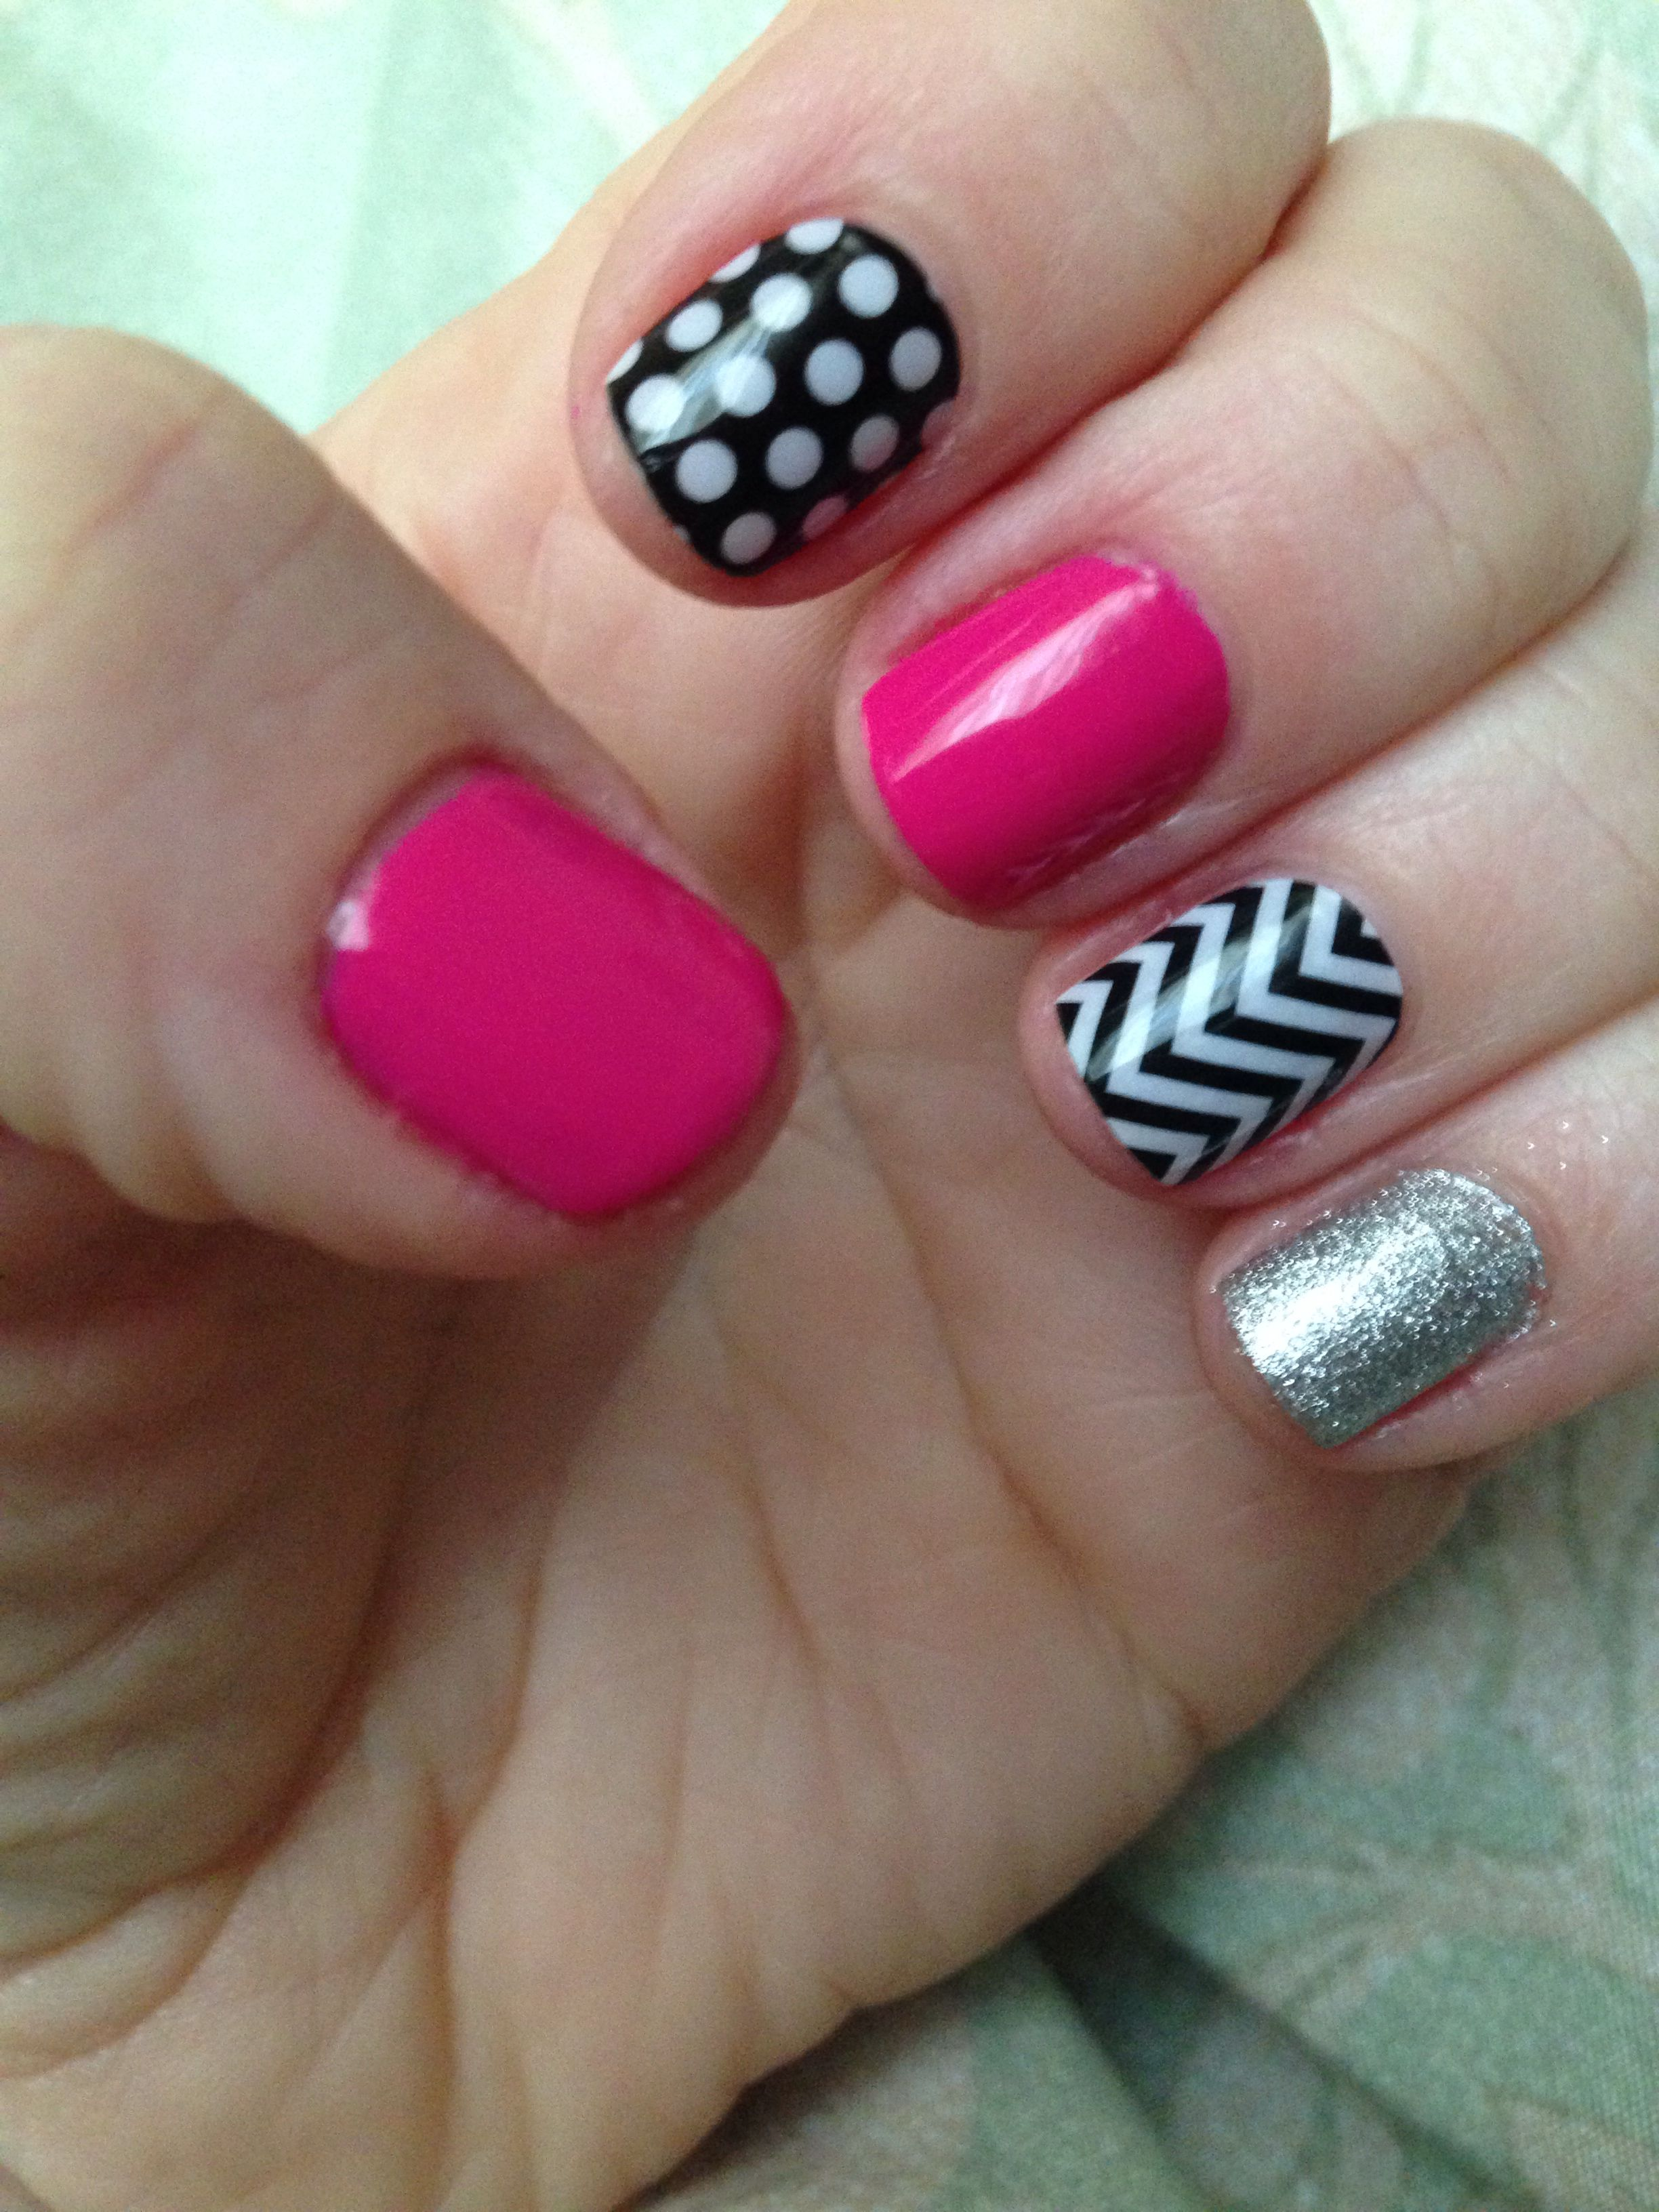 Jamberry nails - Nail art made easy #nailart #jamberrynails Jamberry ...